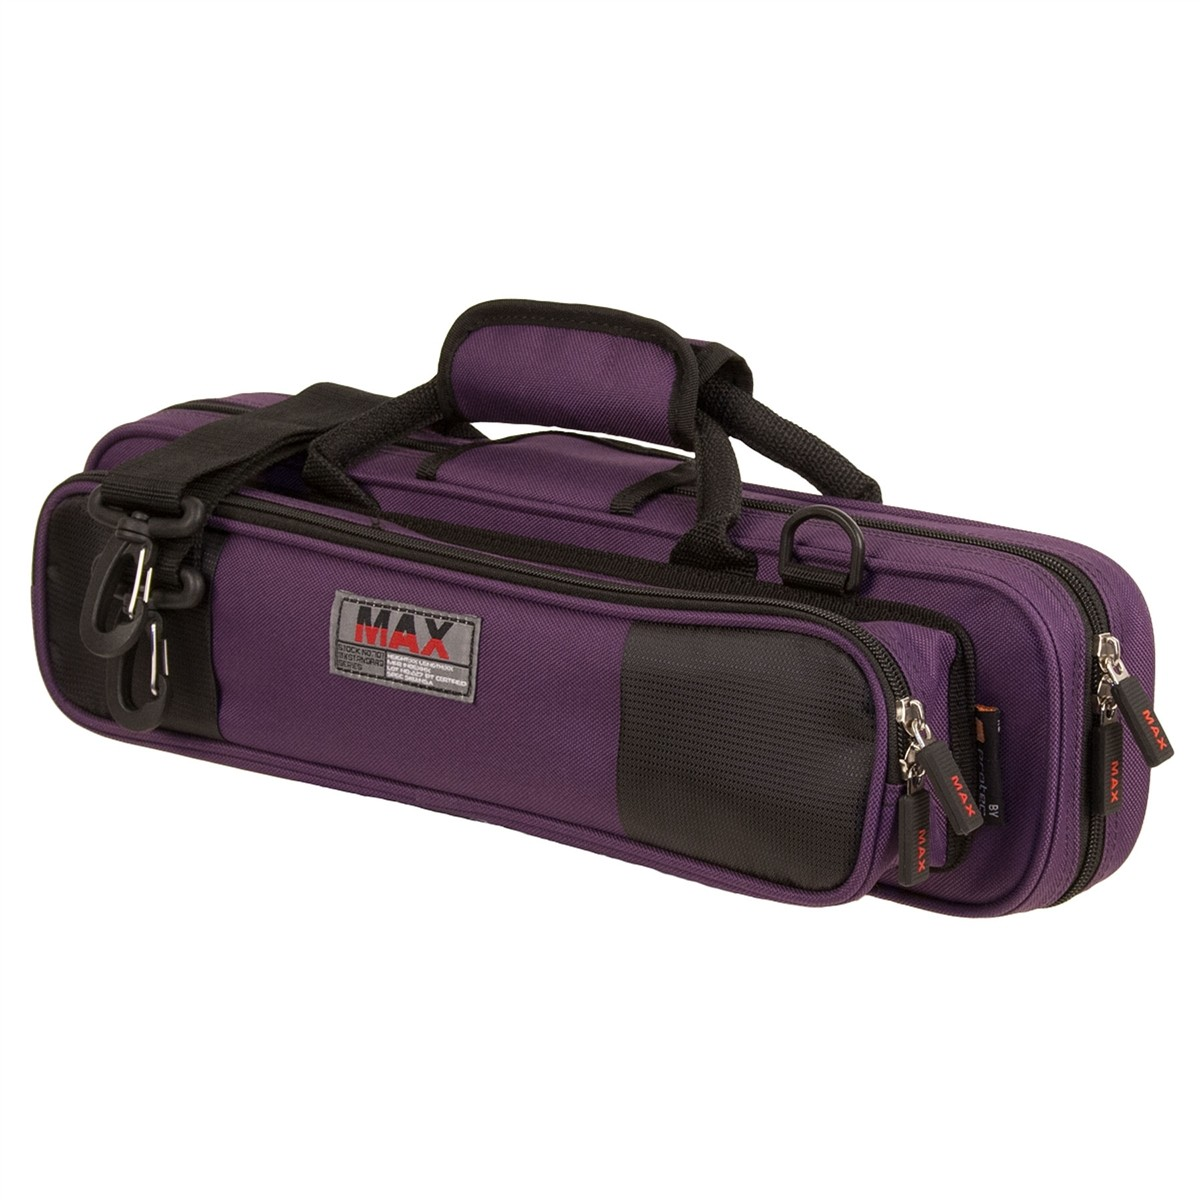 Protec Flute MAX Case (Purple MX308PR)